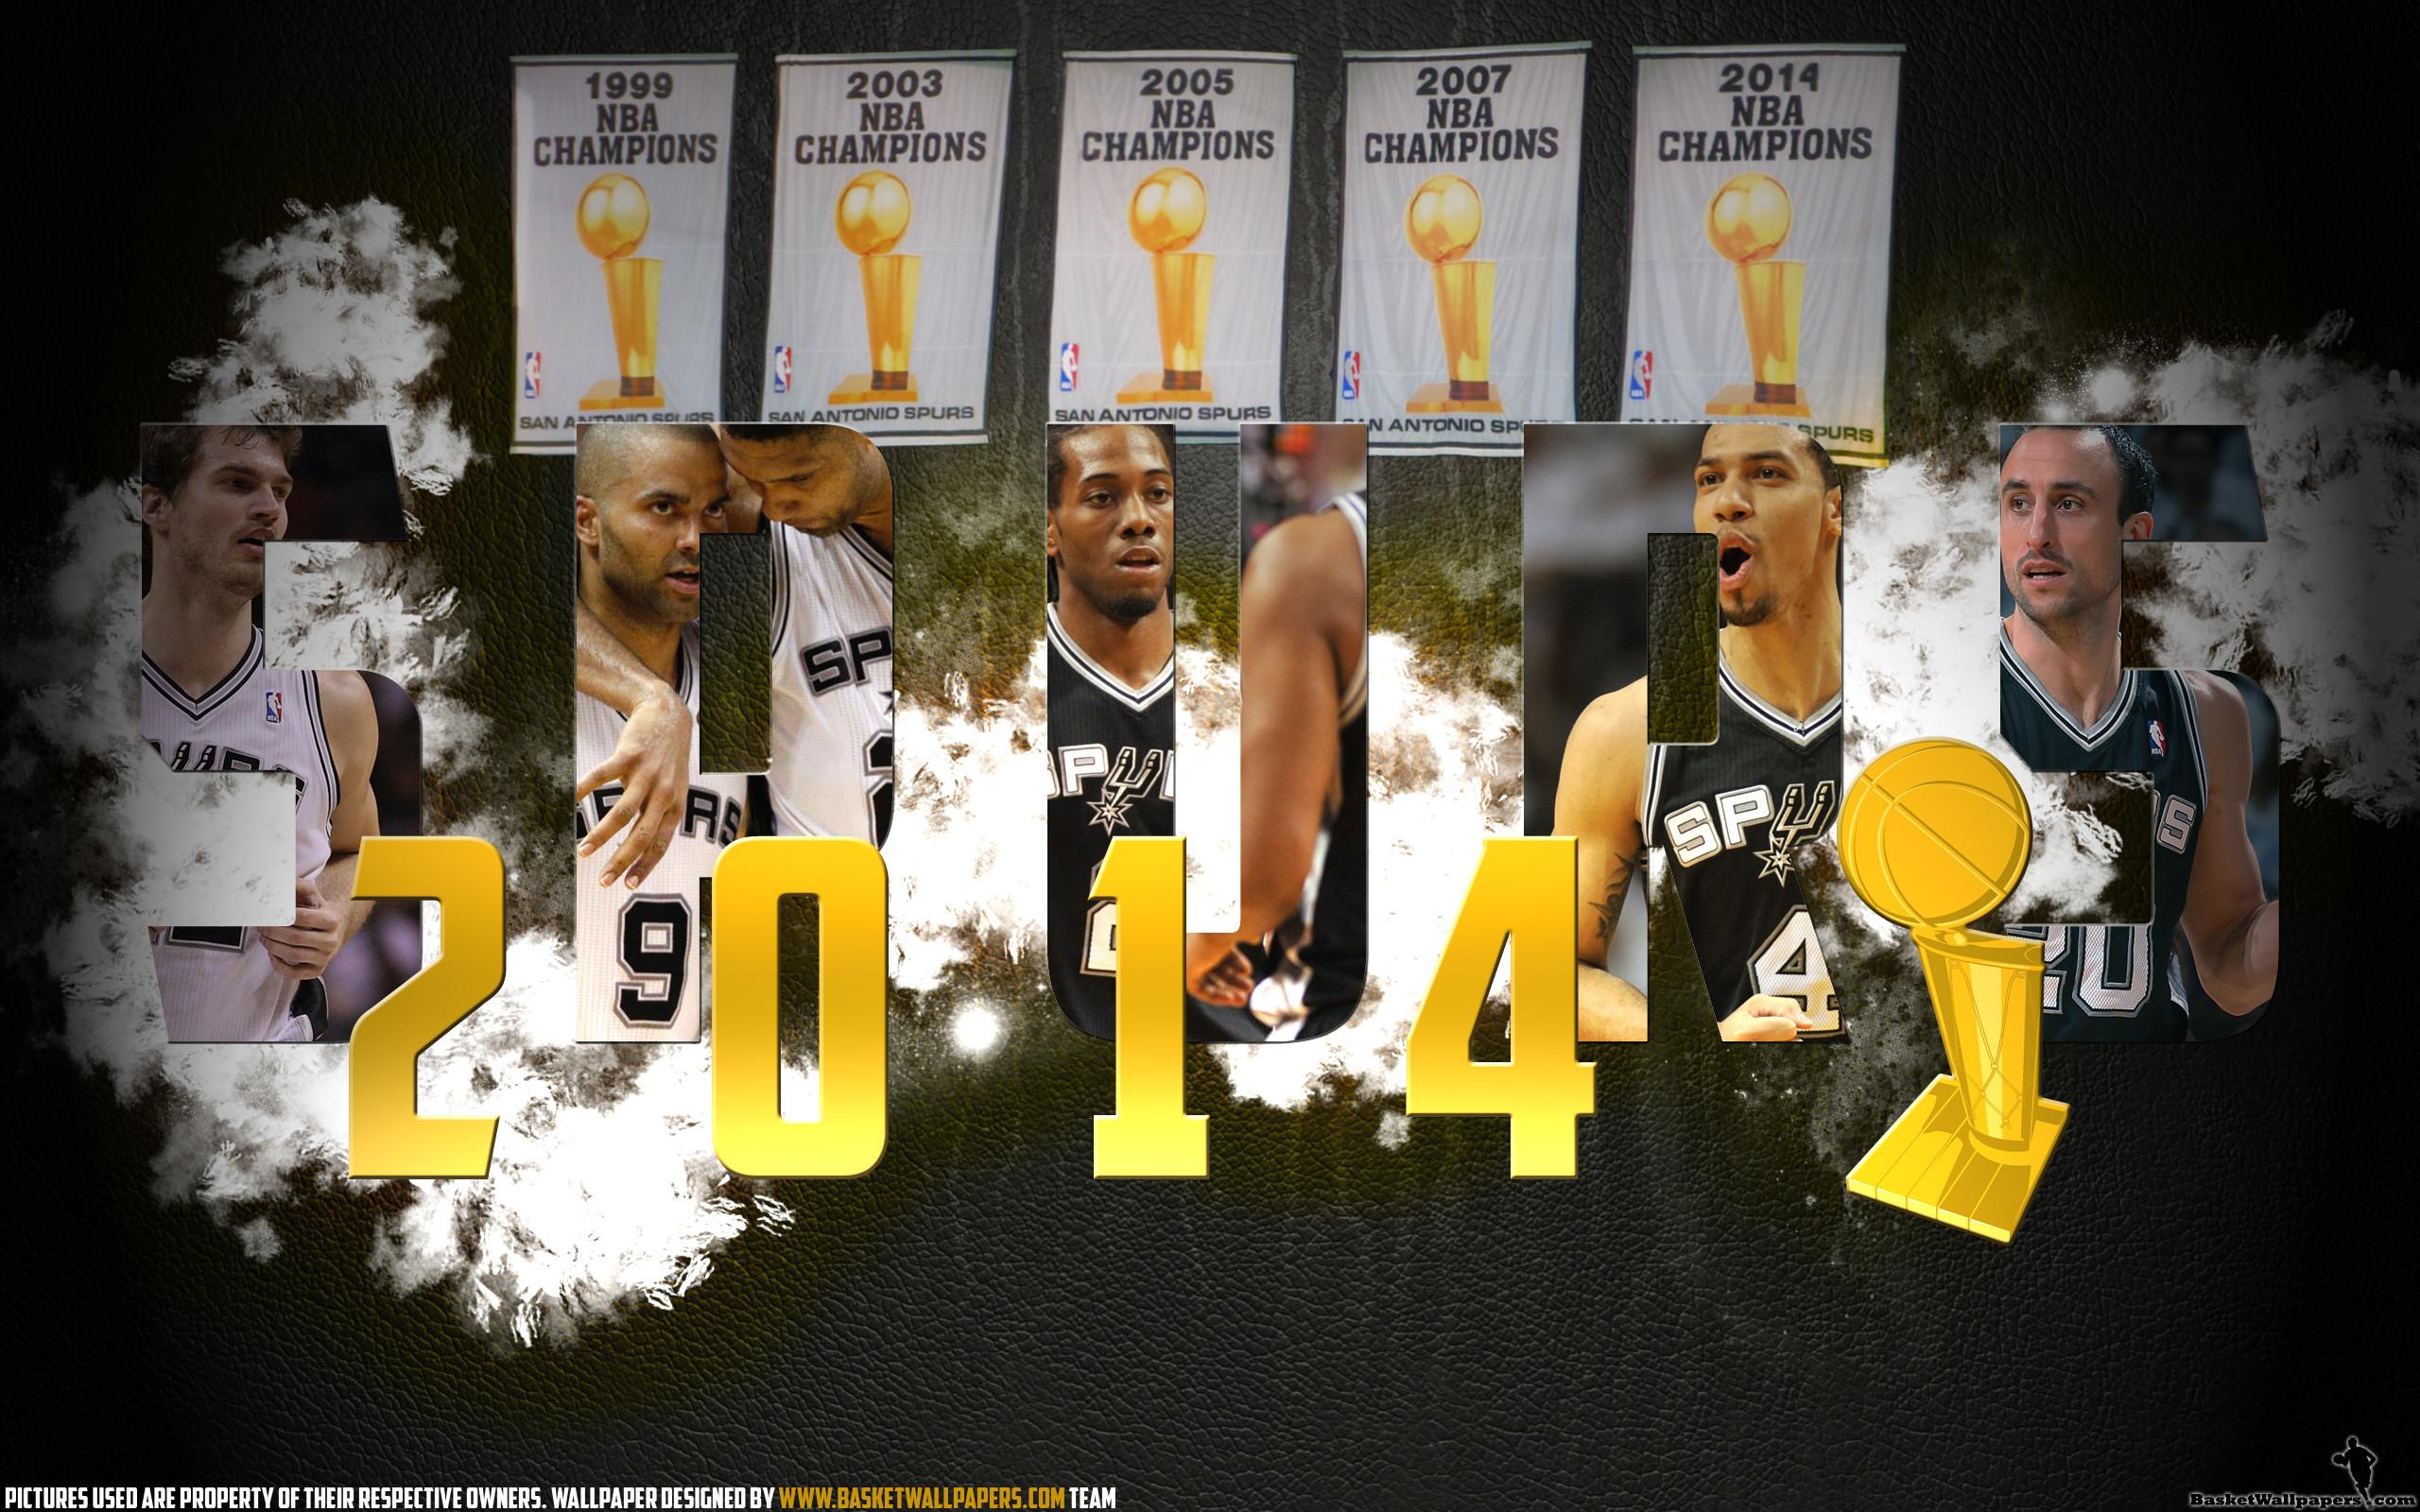 San Antonio Spurs 2014 NBA Champions Wallpaper